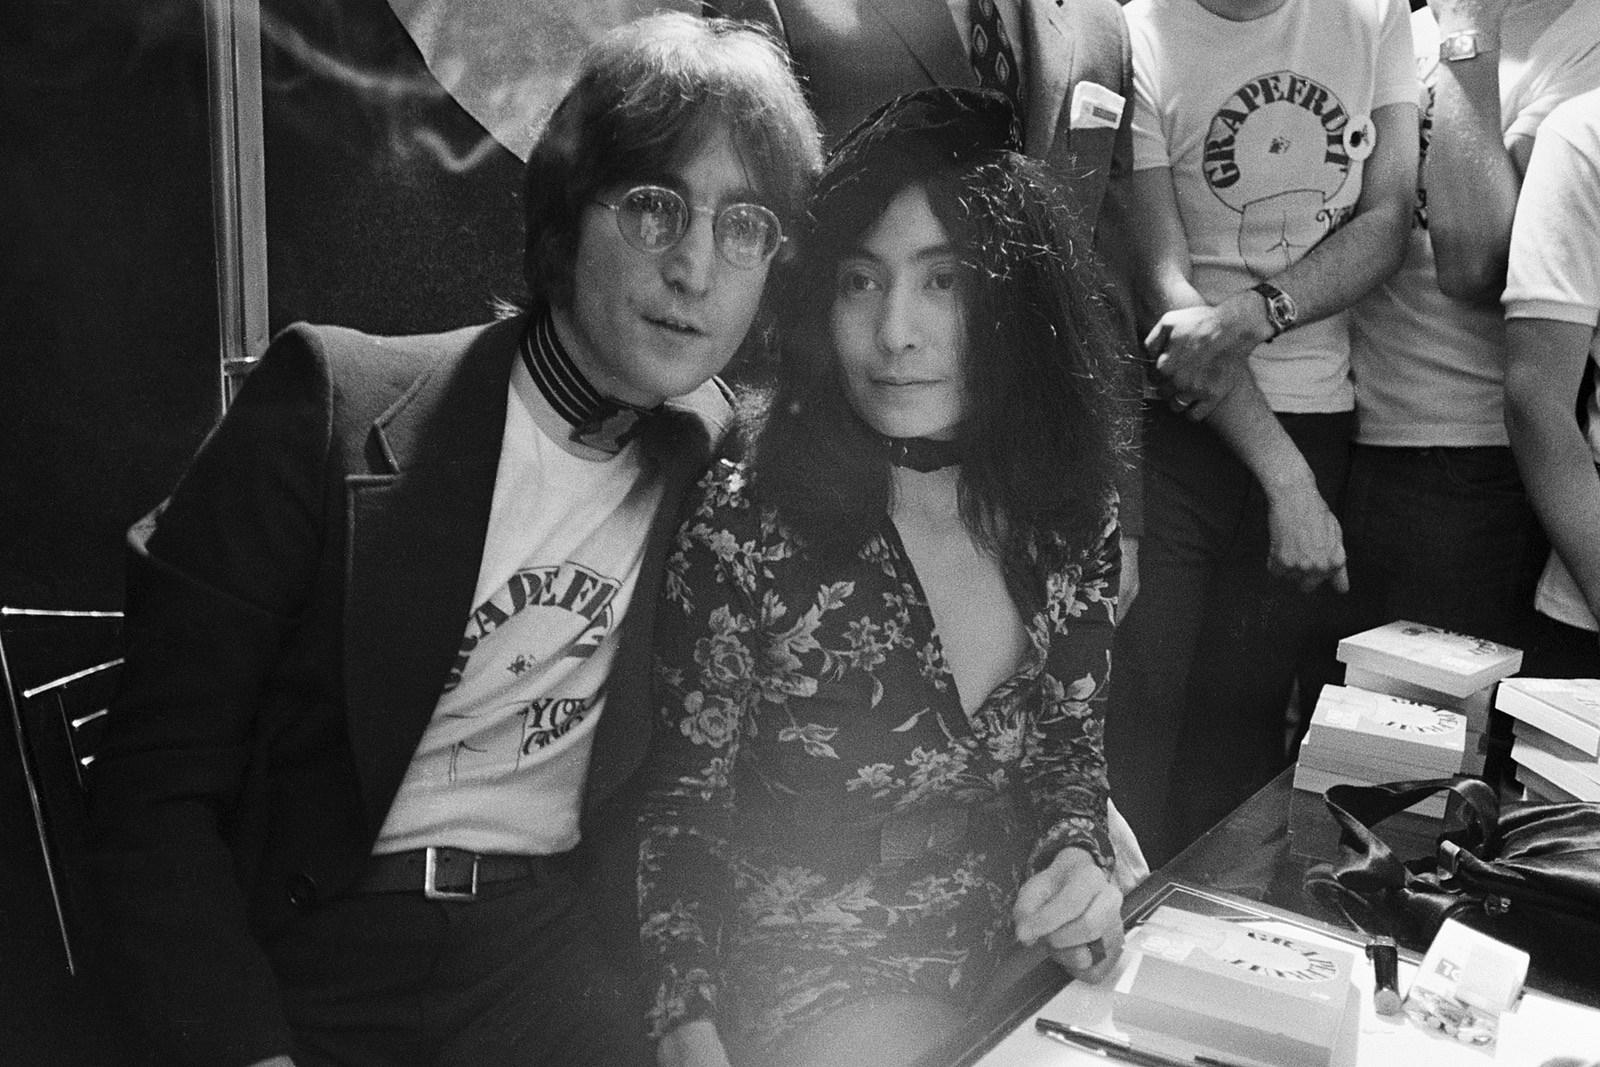 Top 10 Songs Inspired by Yoko Ono